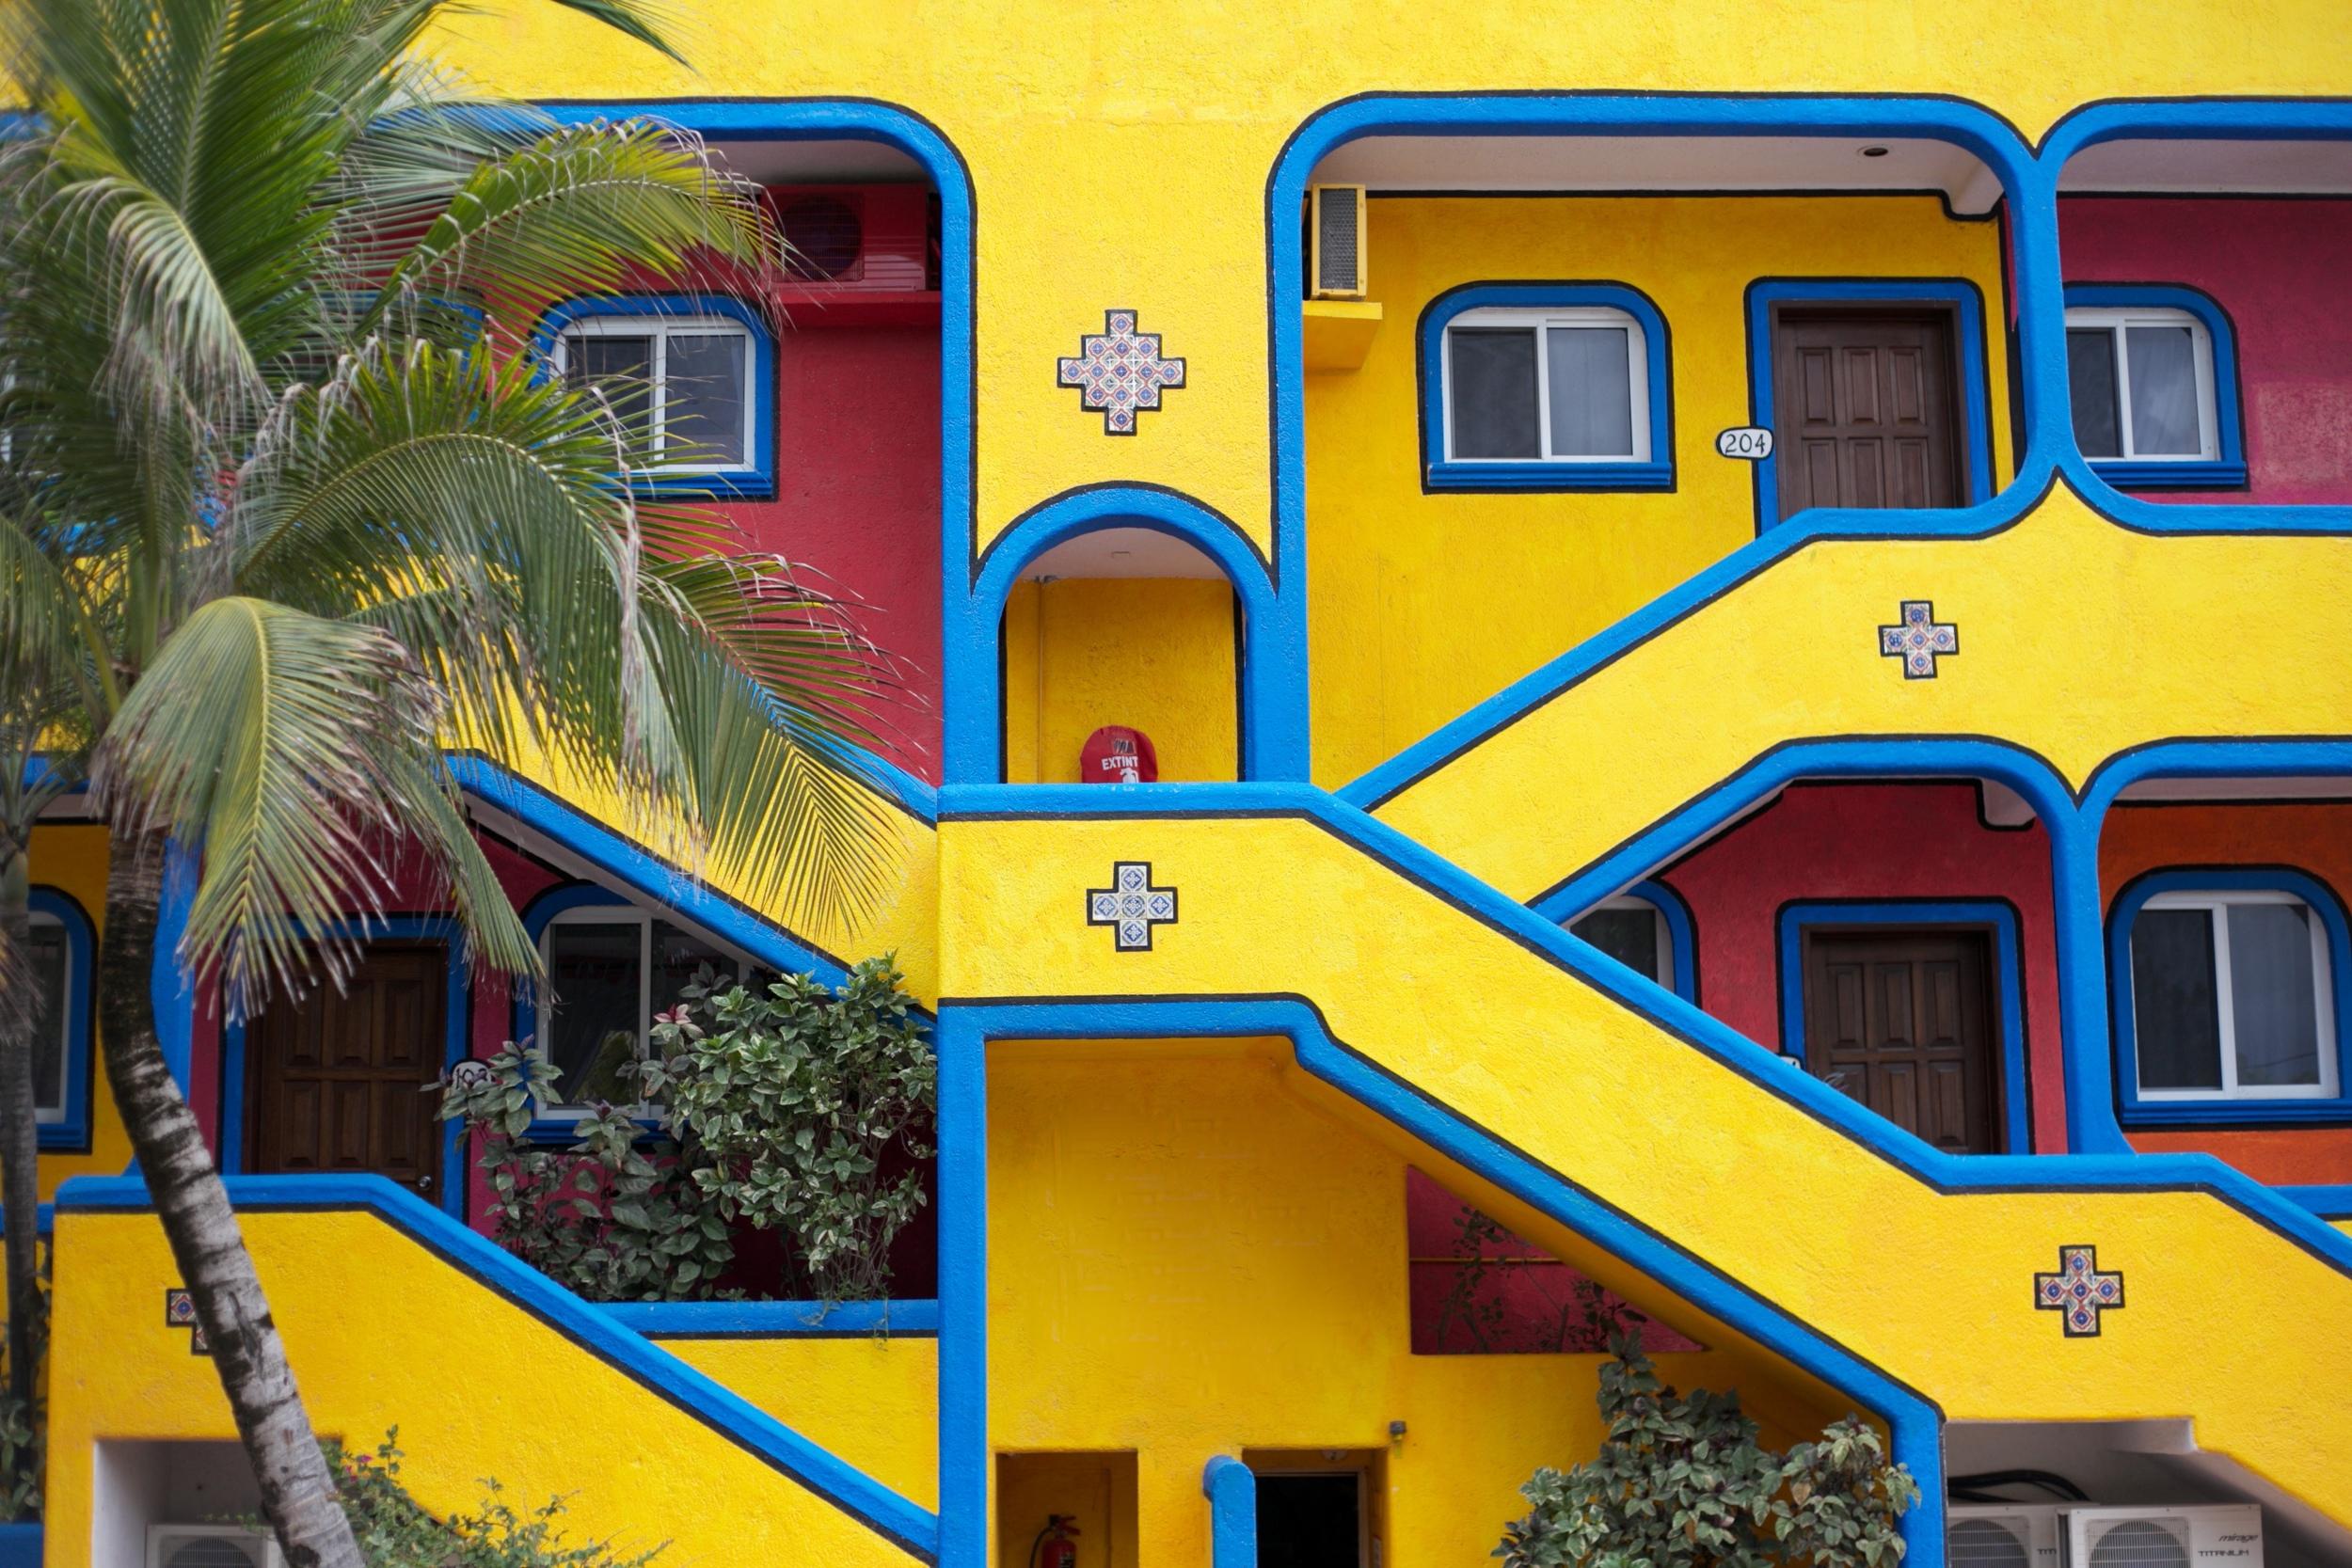 Colourful painted apartments in Akumal, near Cancun, Mexico.